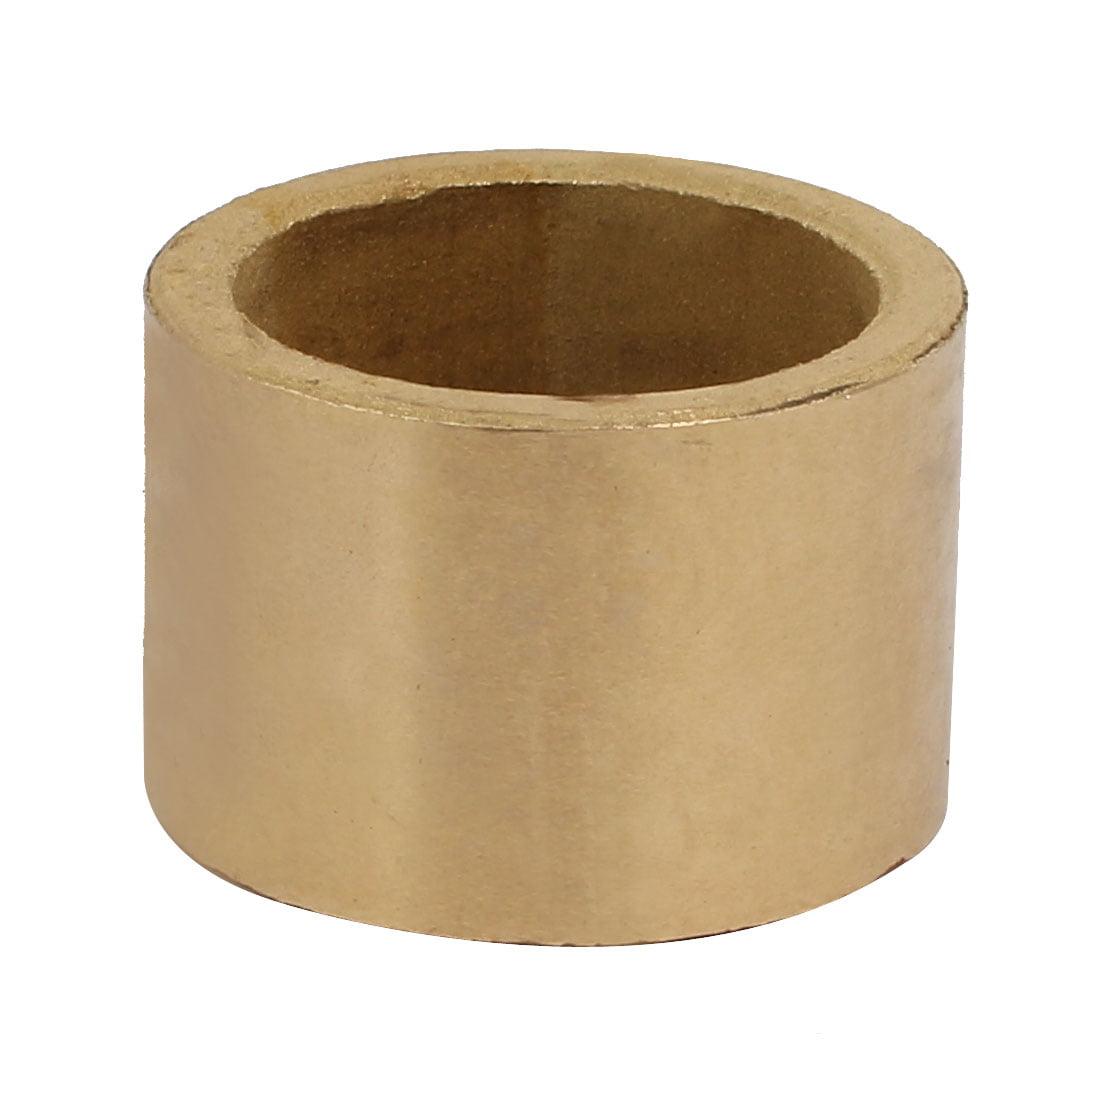 Unique Bargains 25mmx32mmx22mm Powdered Metal Bronze Sleeve Bearing Bushing Gold Tone - image 2 of 3